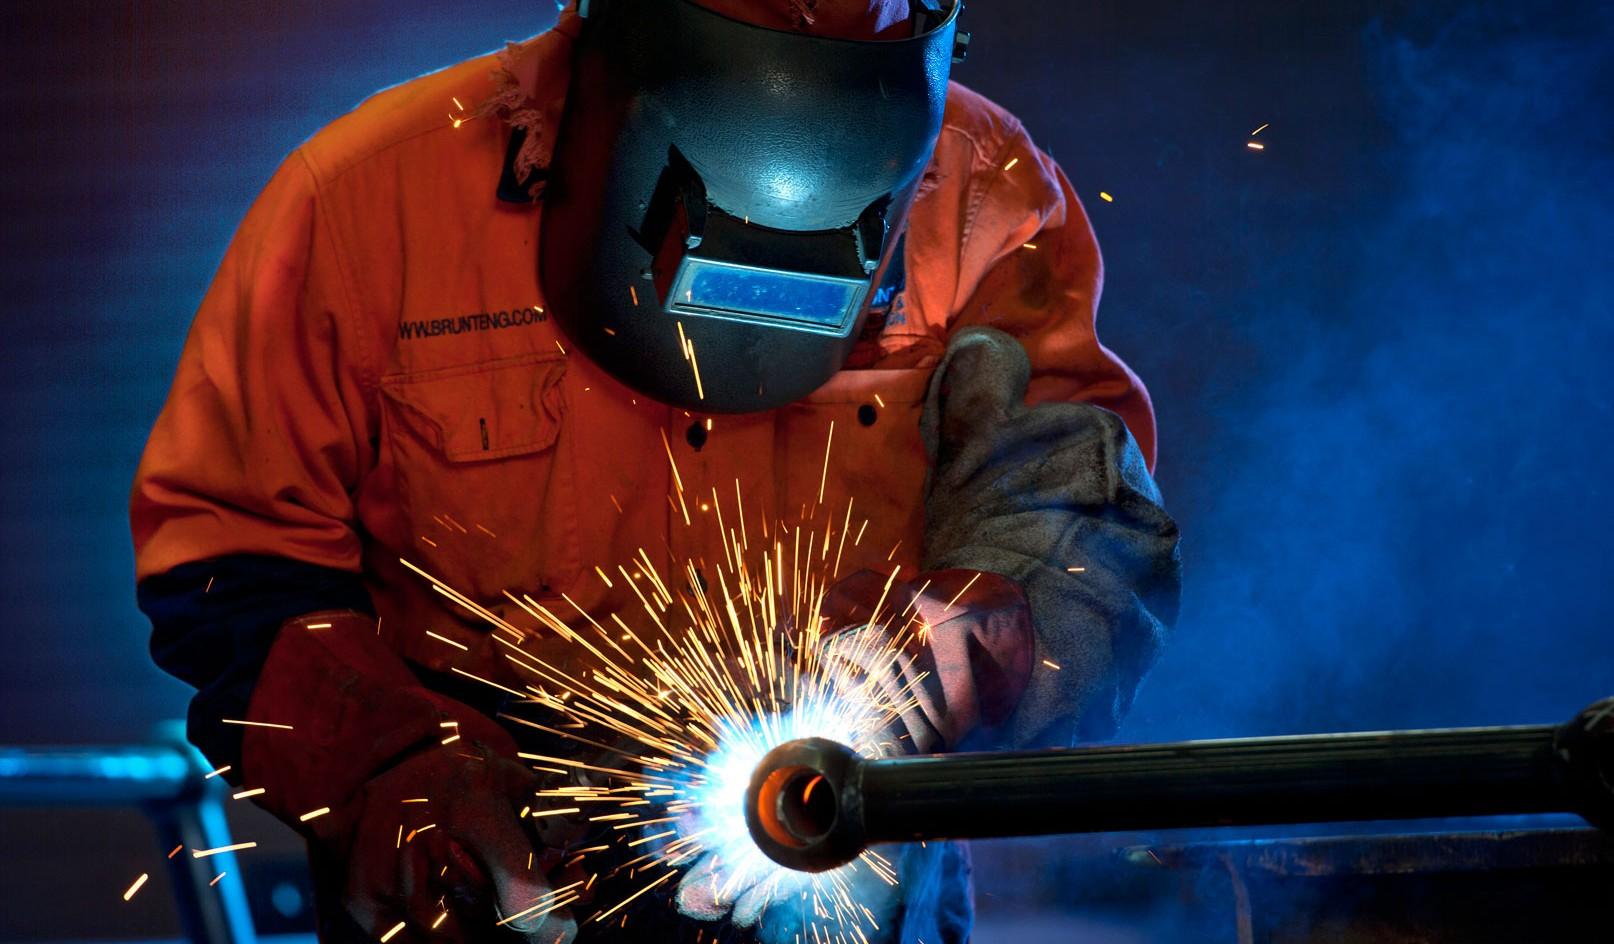 <div>Industrial</div><div> <a href='https://nedmeldrum.com.au/project/welding/'>View Series</a></div>